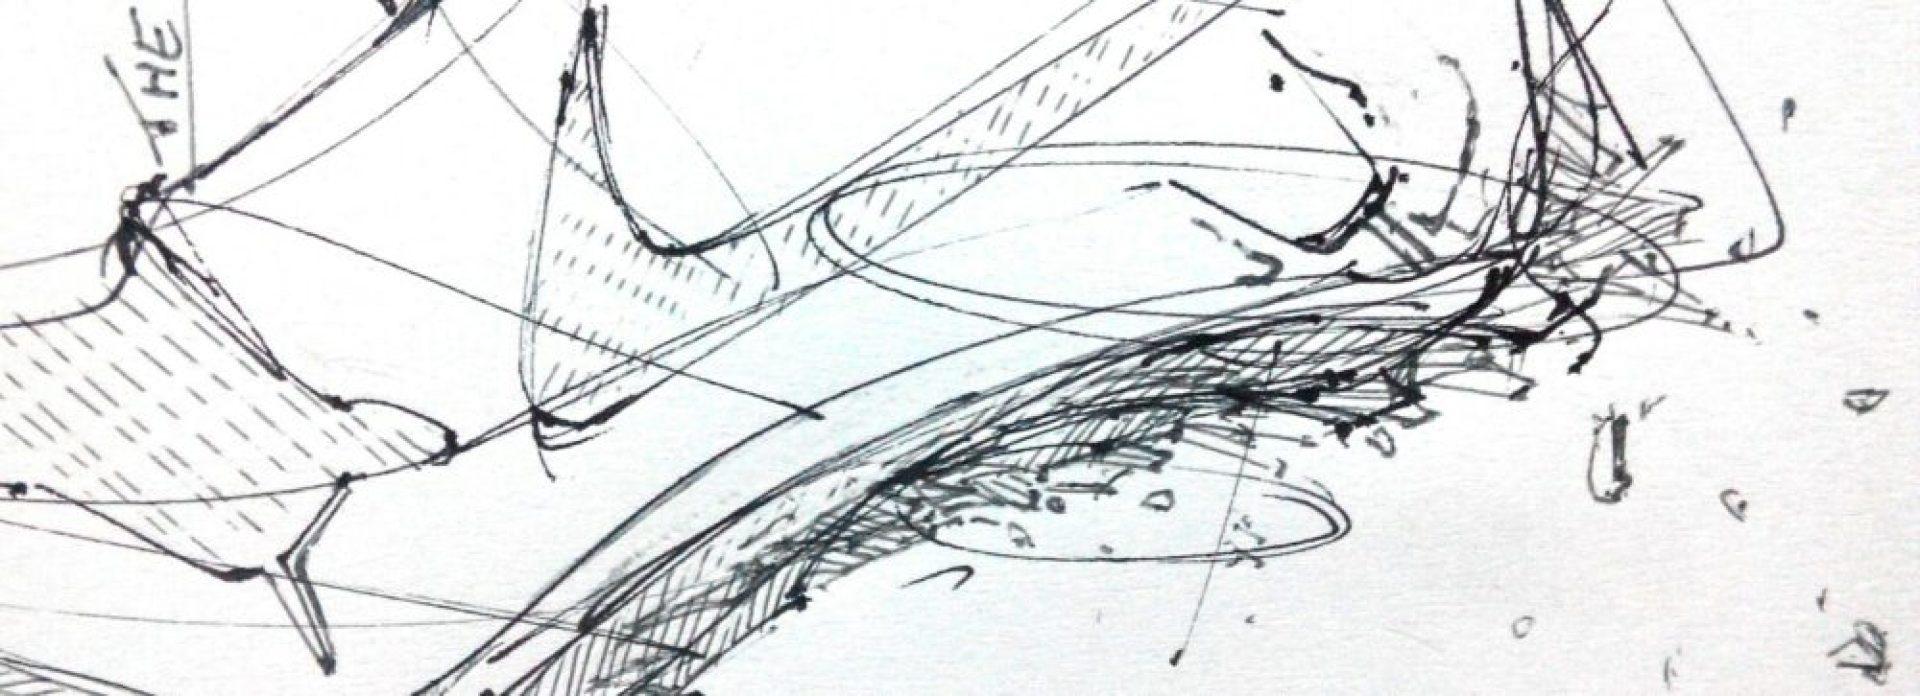 nike-boot-broken-crystal-outsole-theDesignSketchbook-c.jpg